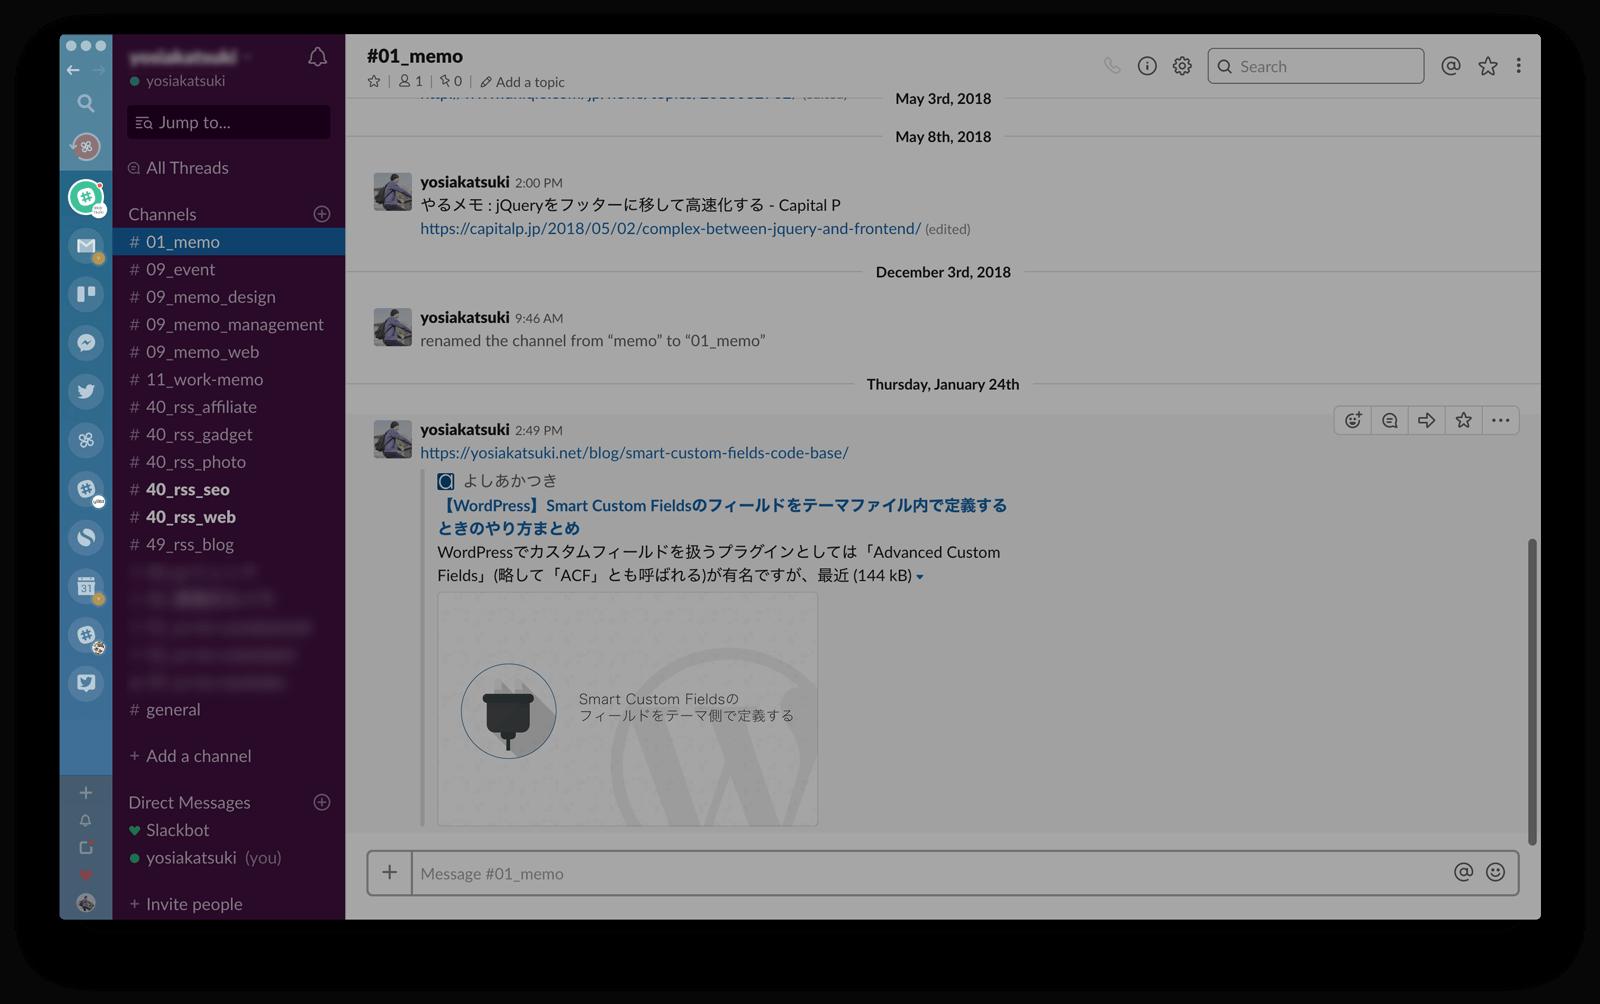 StationはSlackのように左にアイコン、右にアプリの画面が表示される